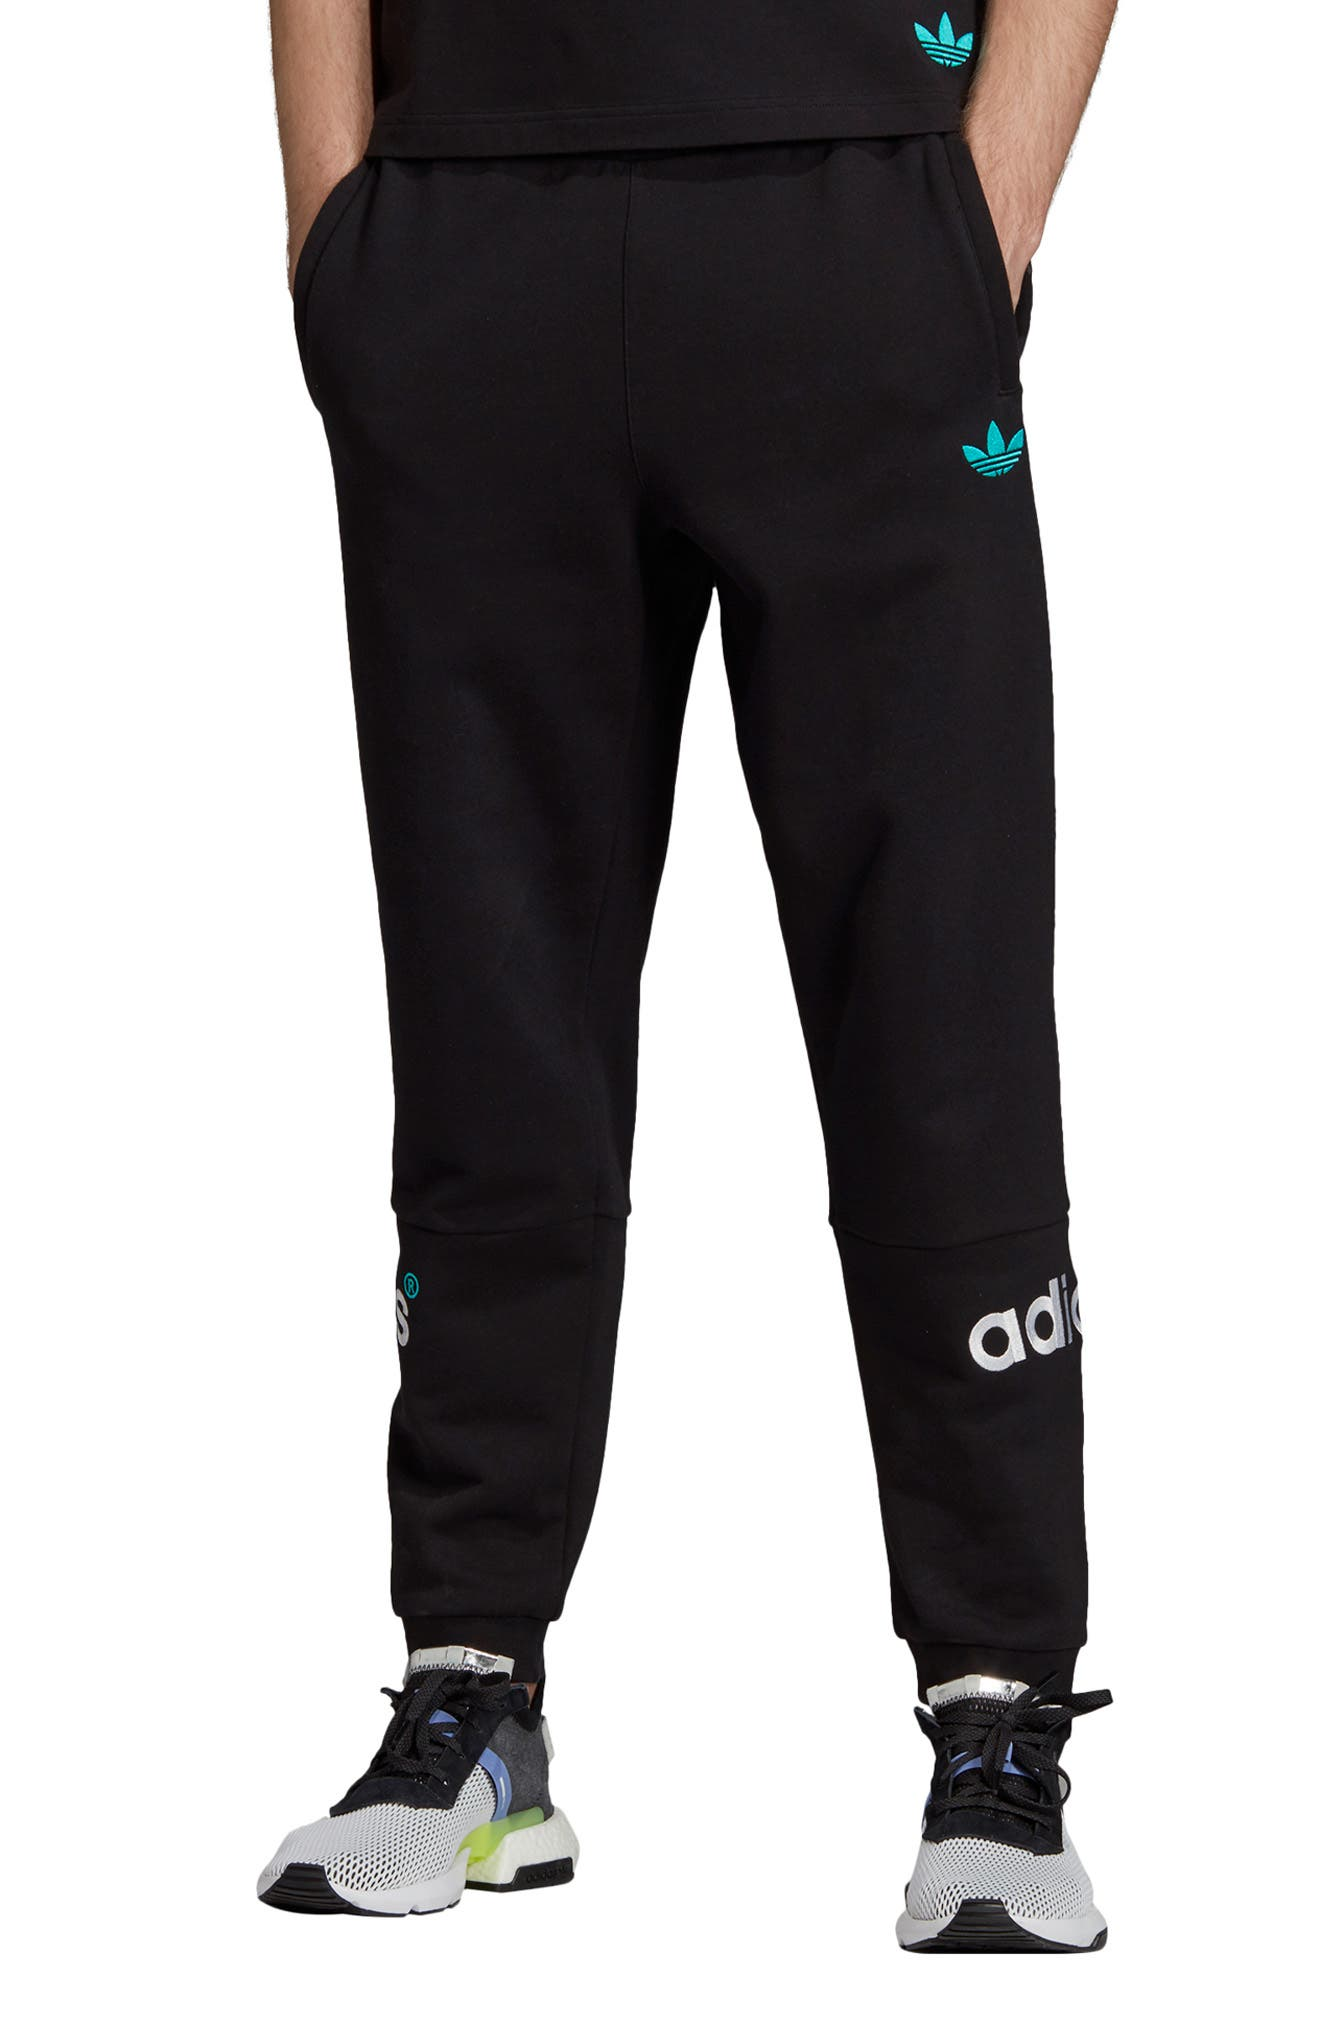 Adidas Originals Arc Tapered Slim Fit Sweatpants